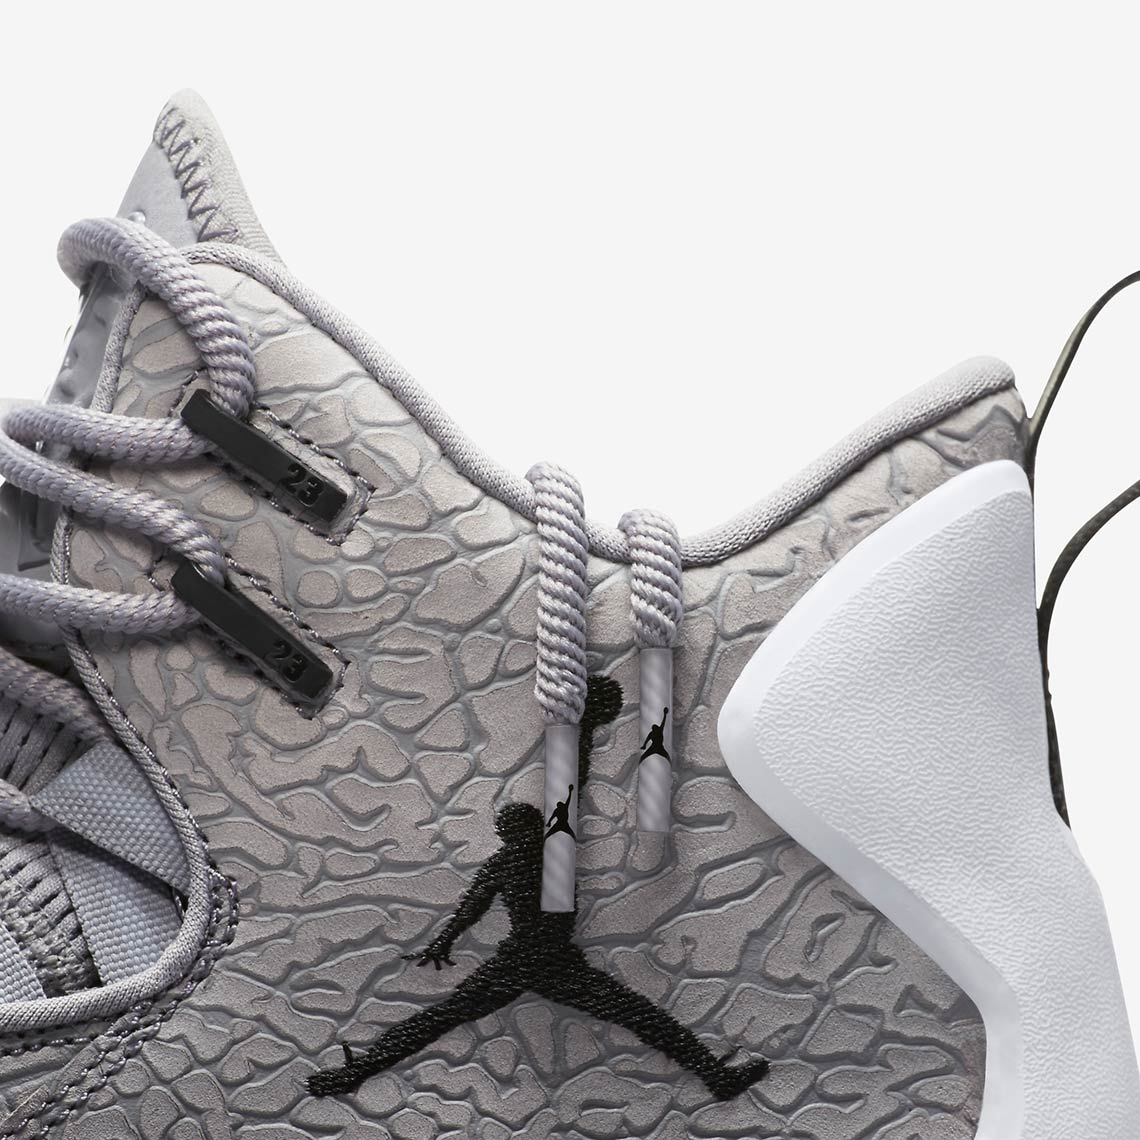 3c6c2272779 Jordan Super Fly MVP Elephant Print AT3005-002 Available Now ...